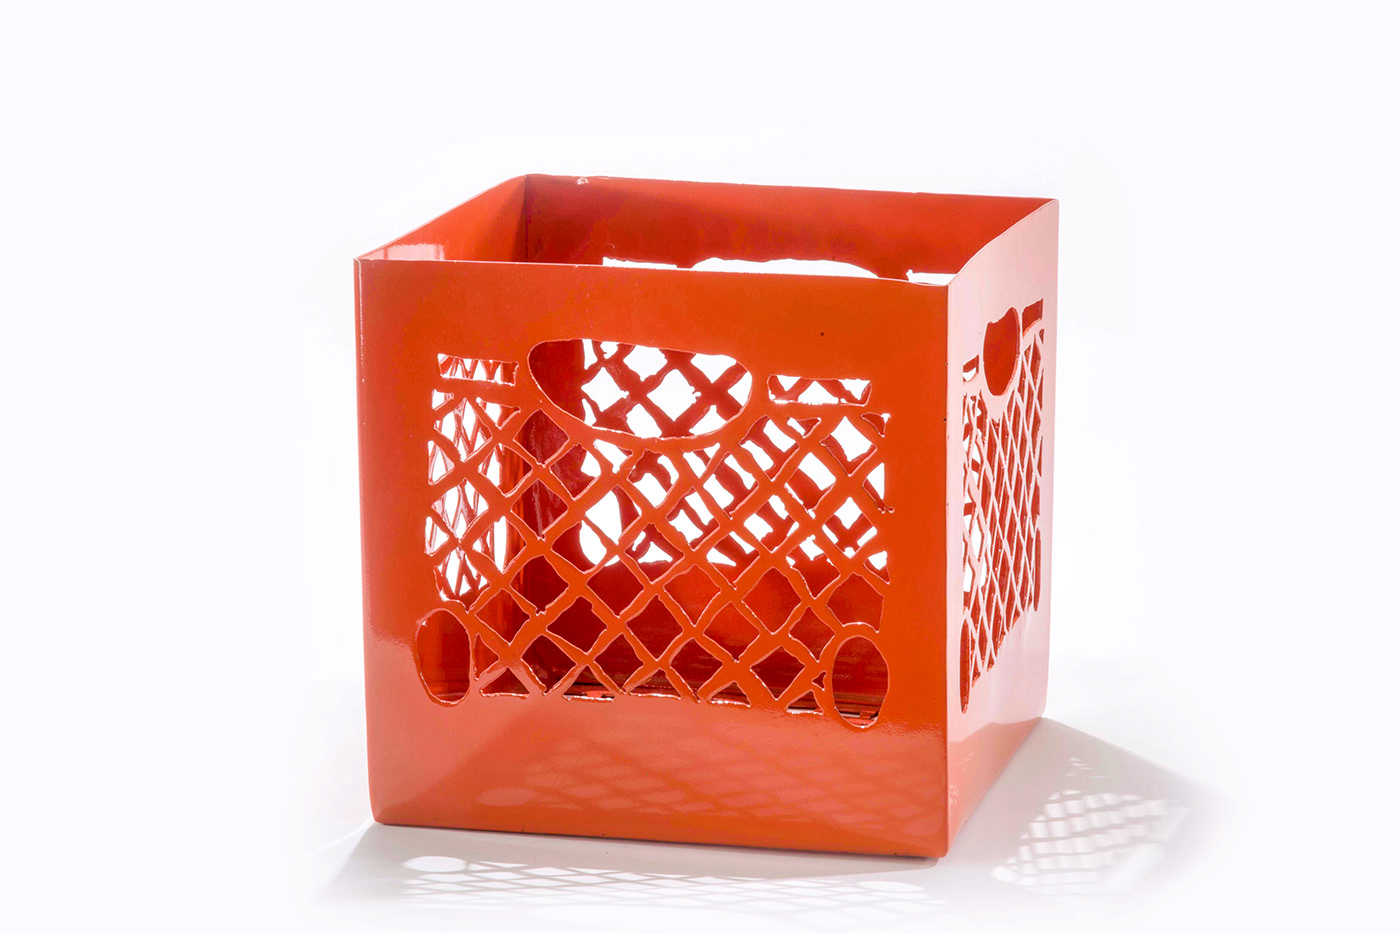 welding furniture design  hand made product design  toy design